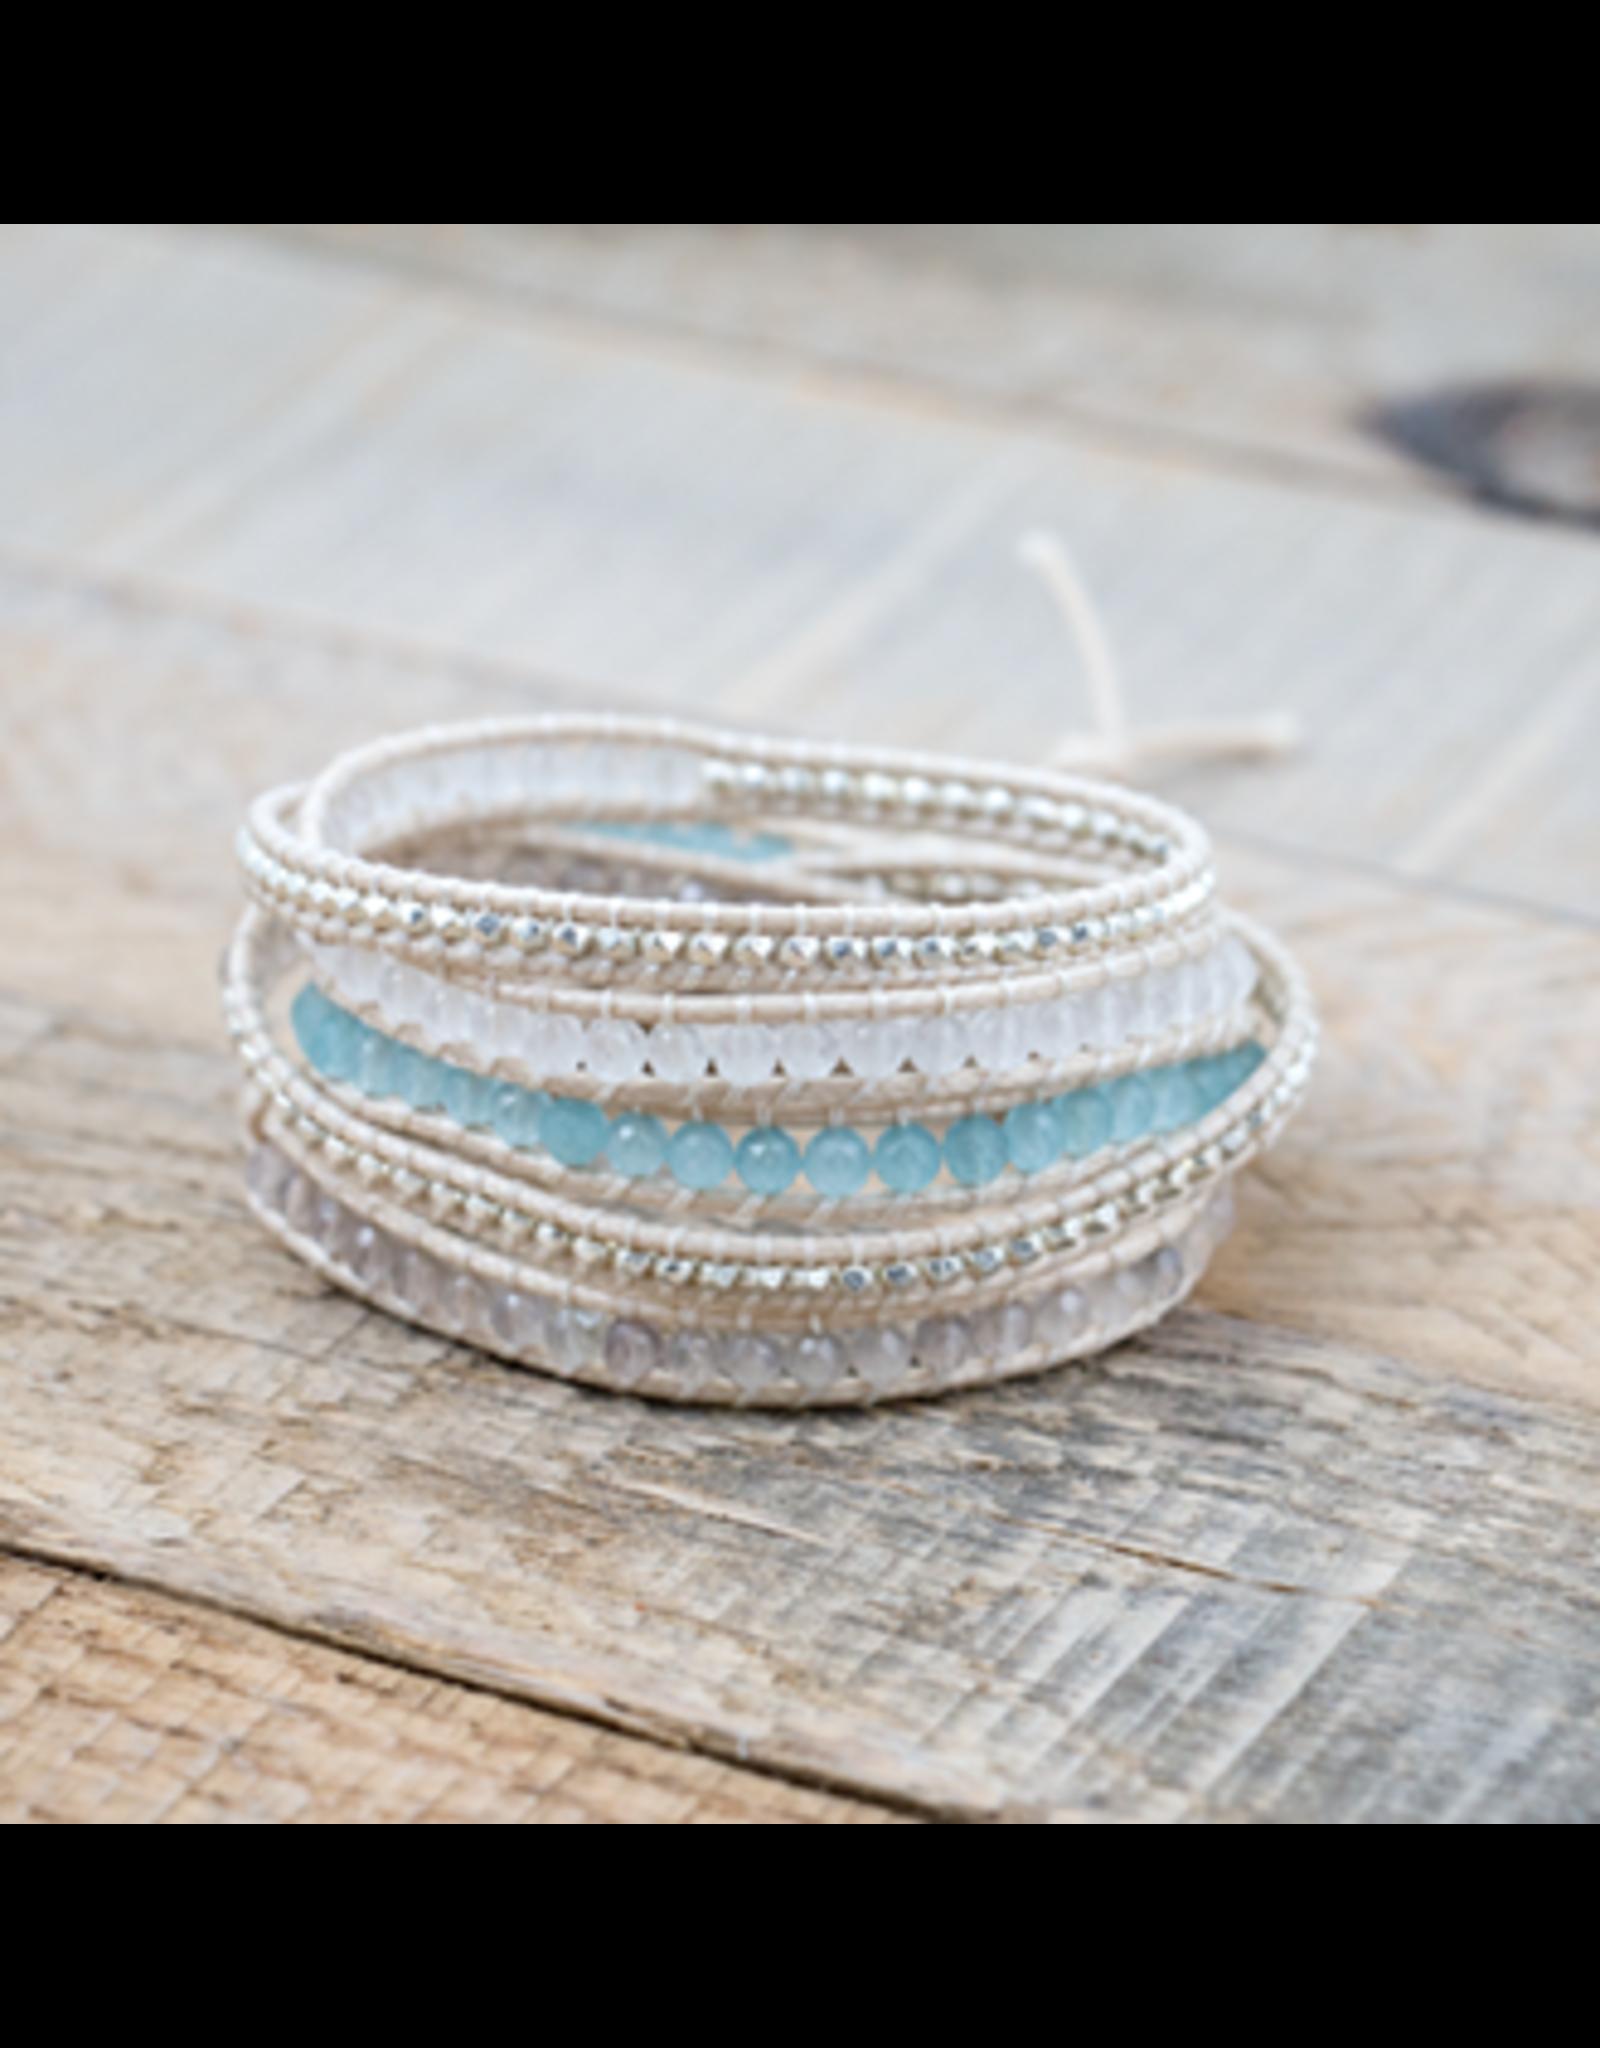 Glee jewelry Cali Wrap#6-Blue/White/Silver